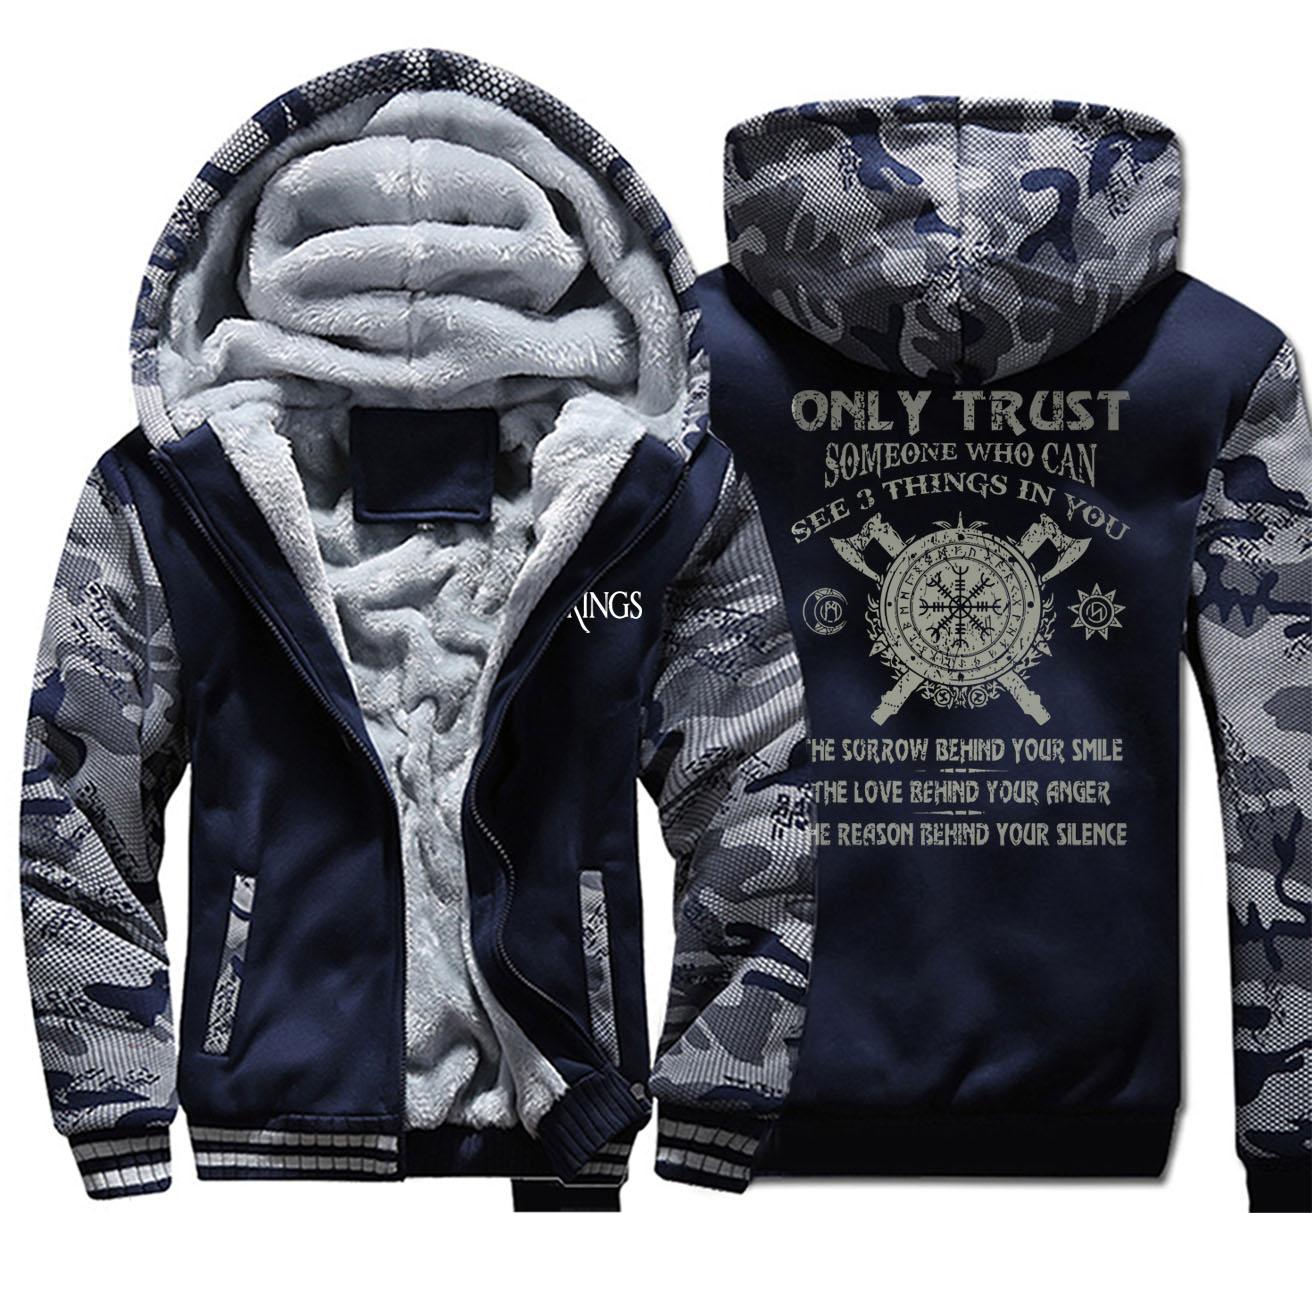 2020 Viking Legend Outwear Men Winter Thick Men's Hipster Hoodies Vintage Streetwear Clothing Motorcycle Camouflage Jackets Warm